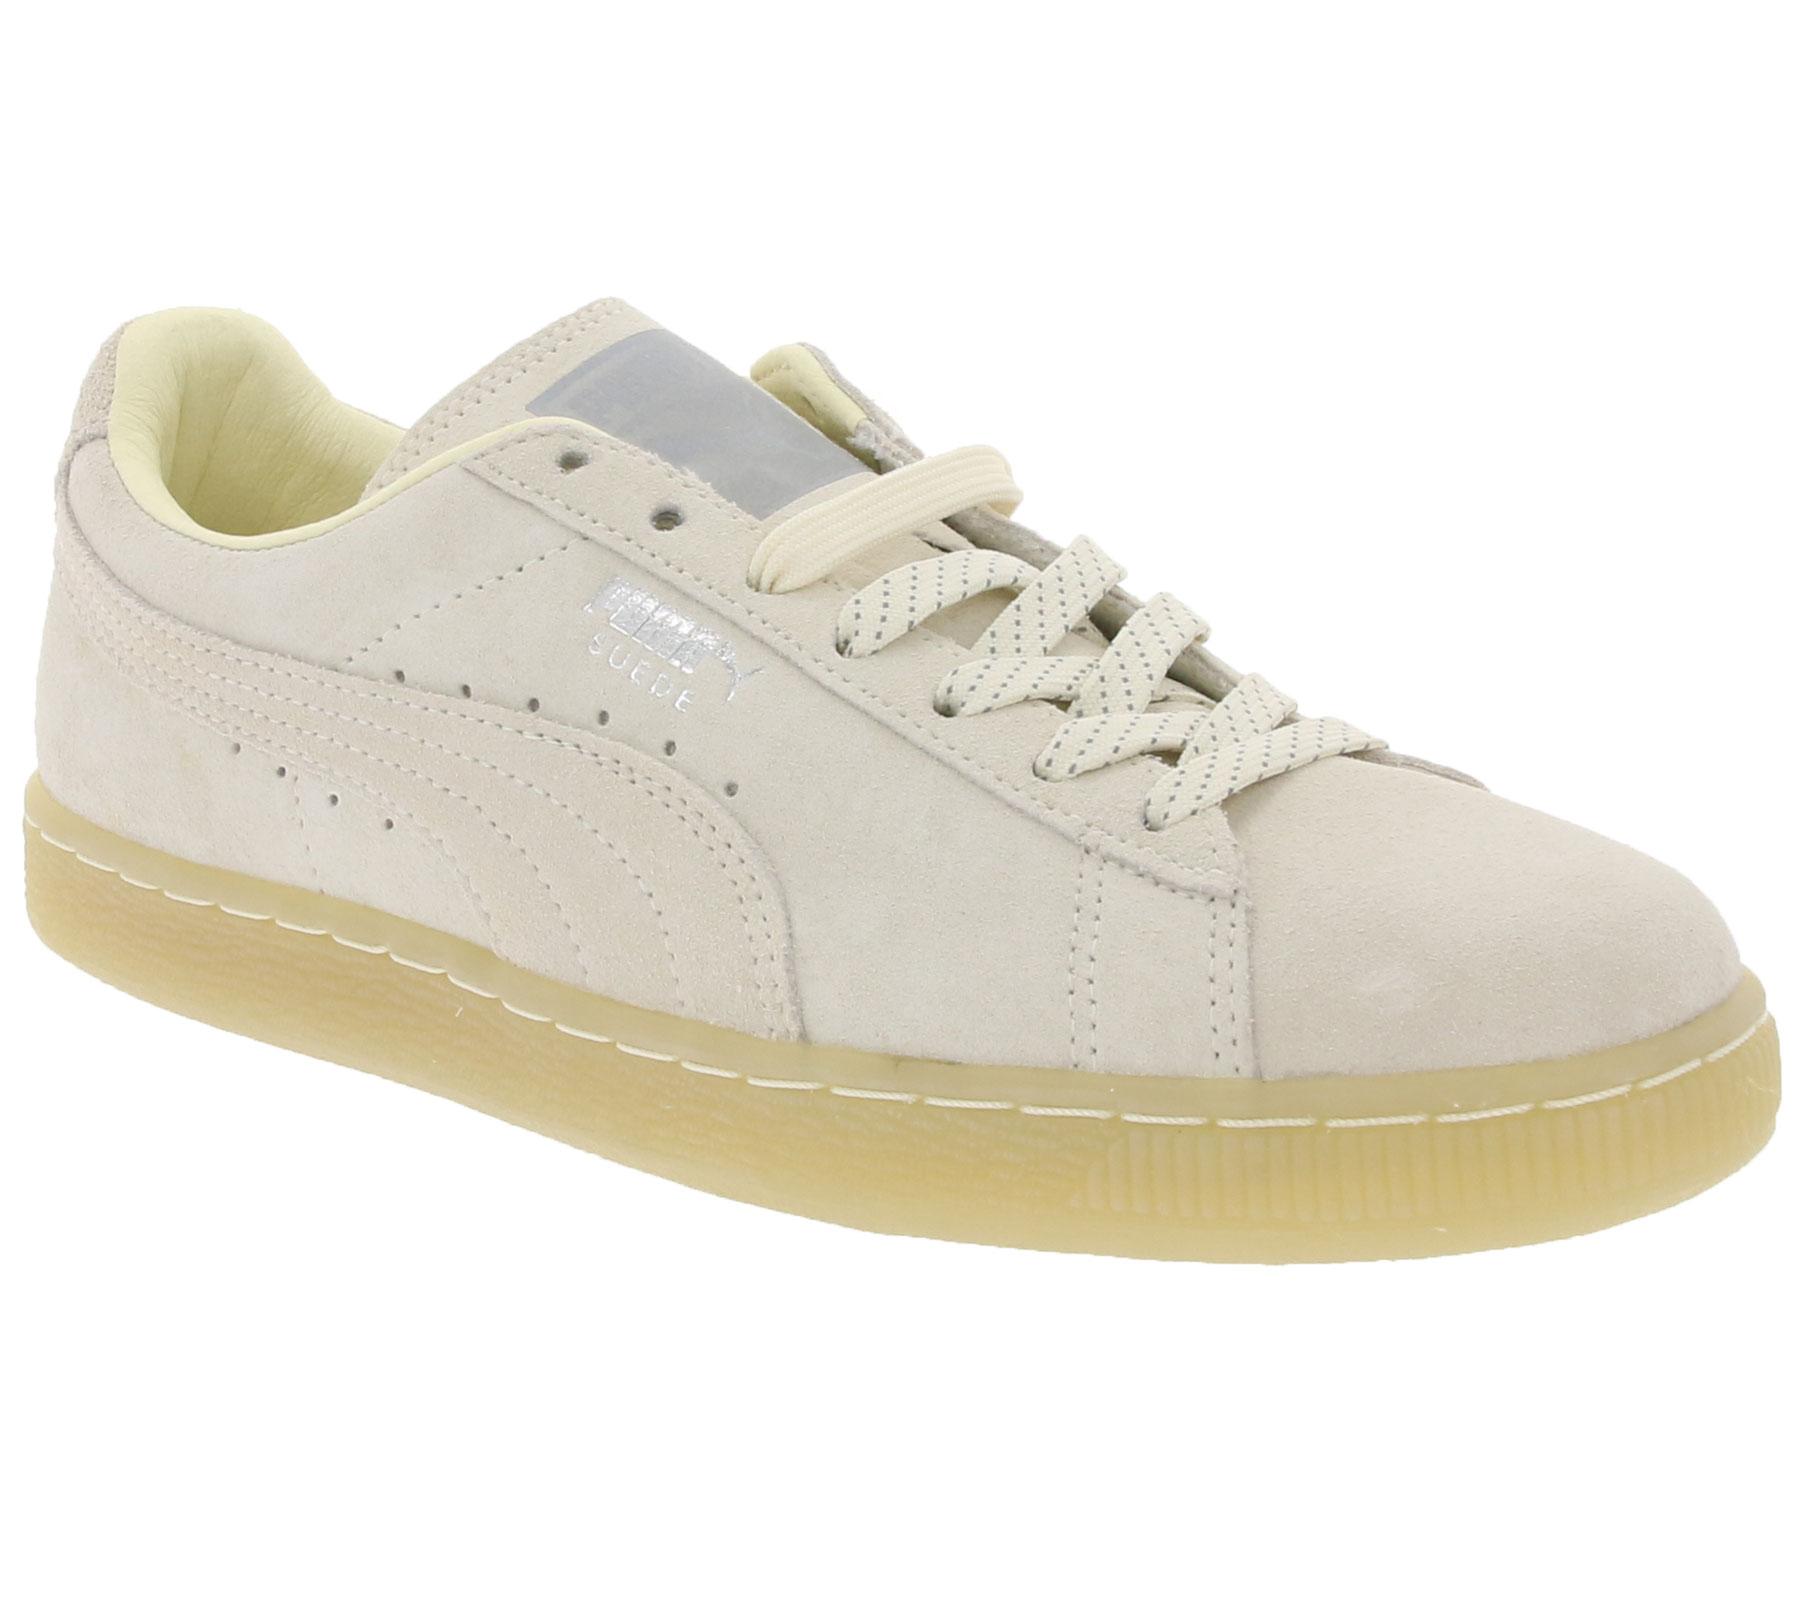 Puma Basket Ostrich Women's Sneakers outlet | 366727 01